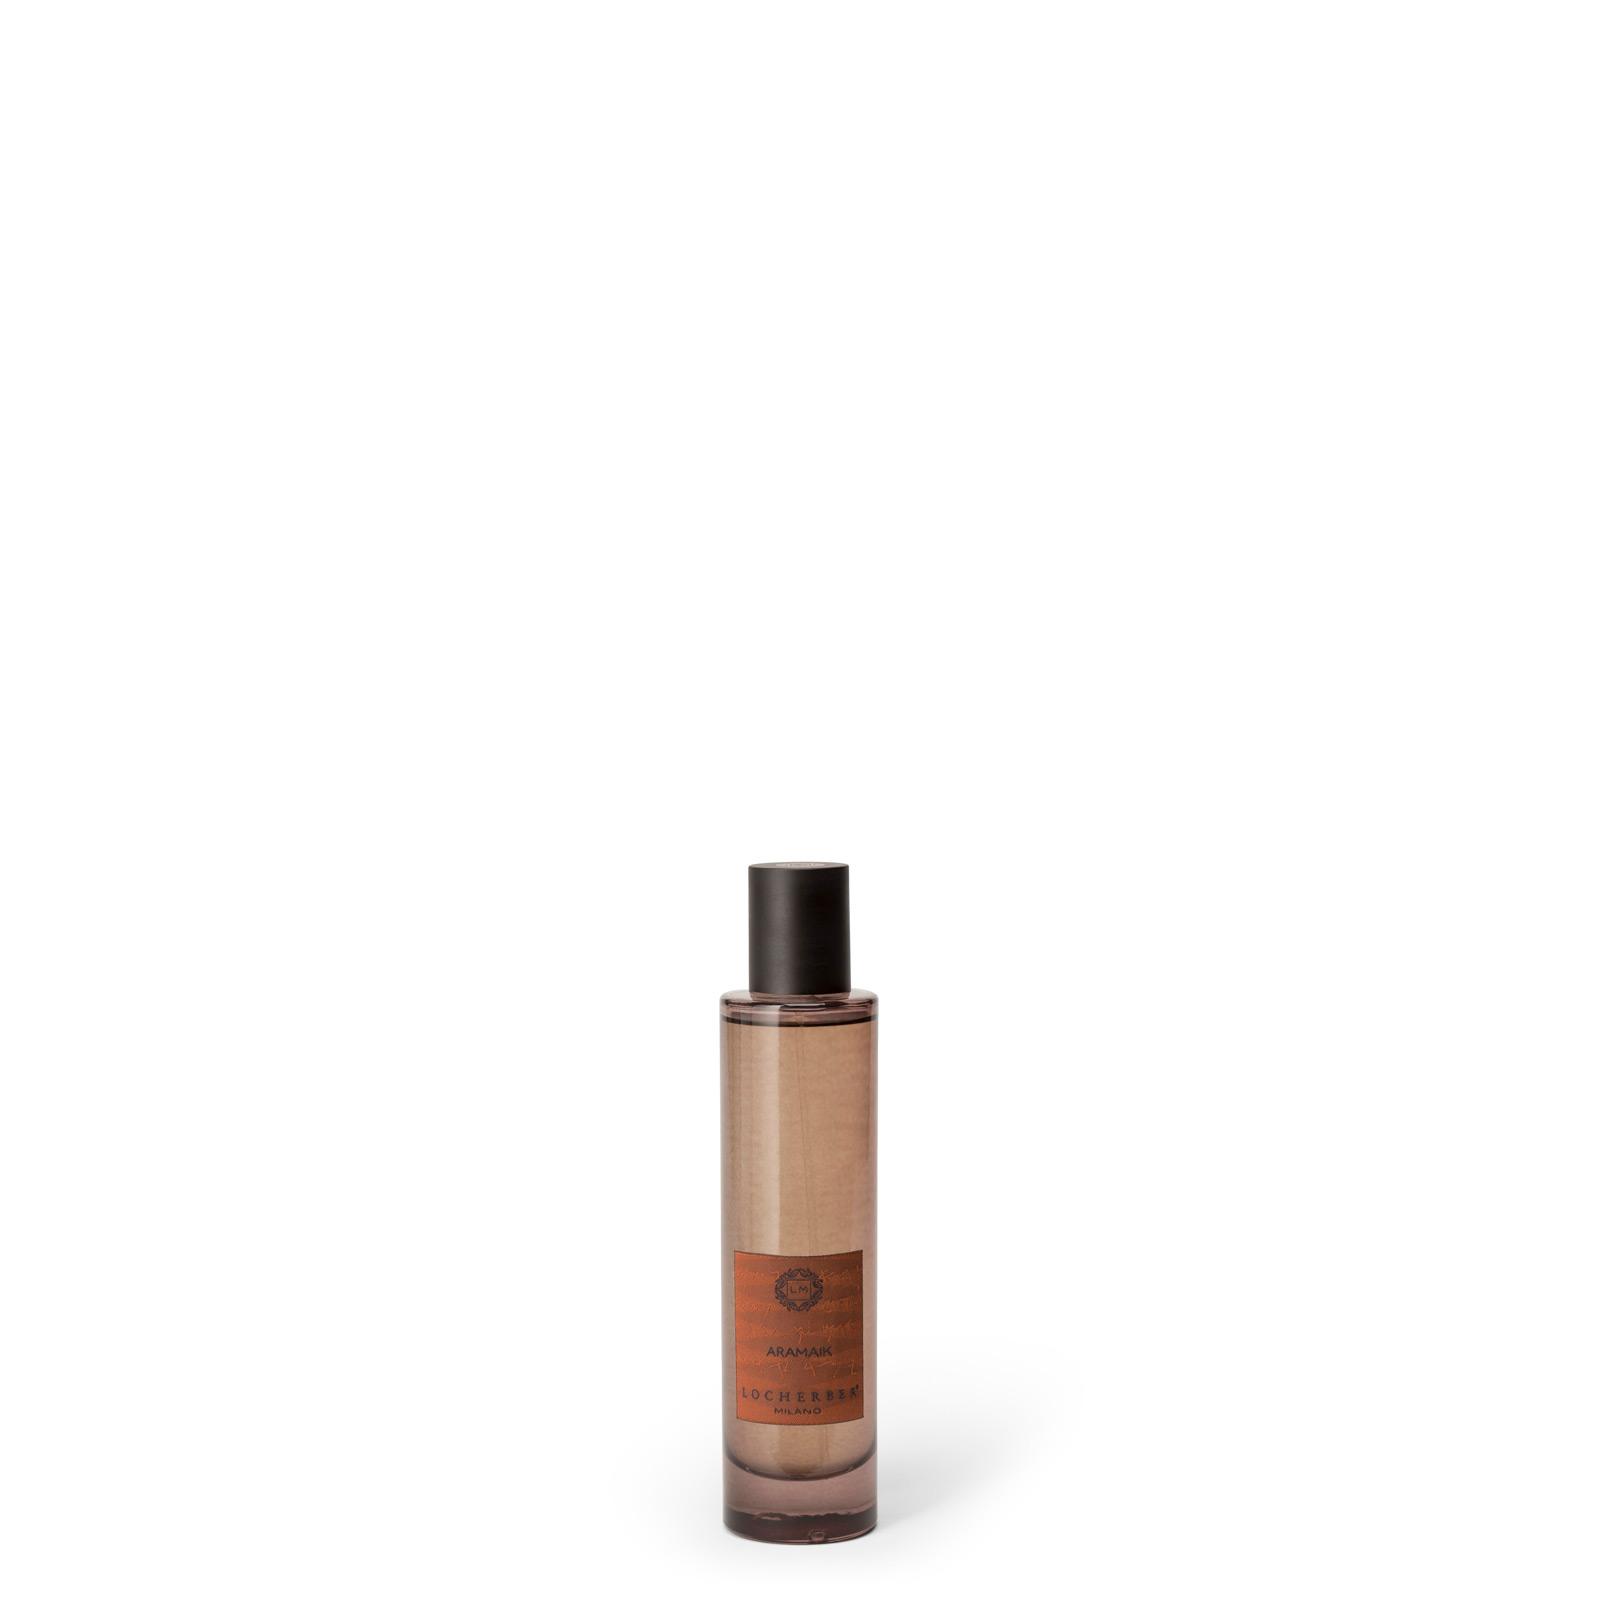 Locherber Milano – Aramaik – Diffusor - Raumduft - Spray 100 ml